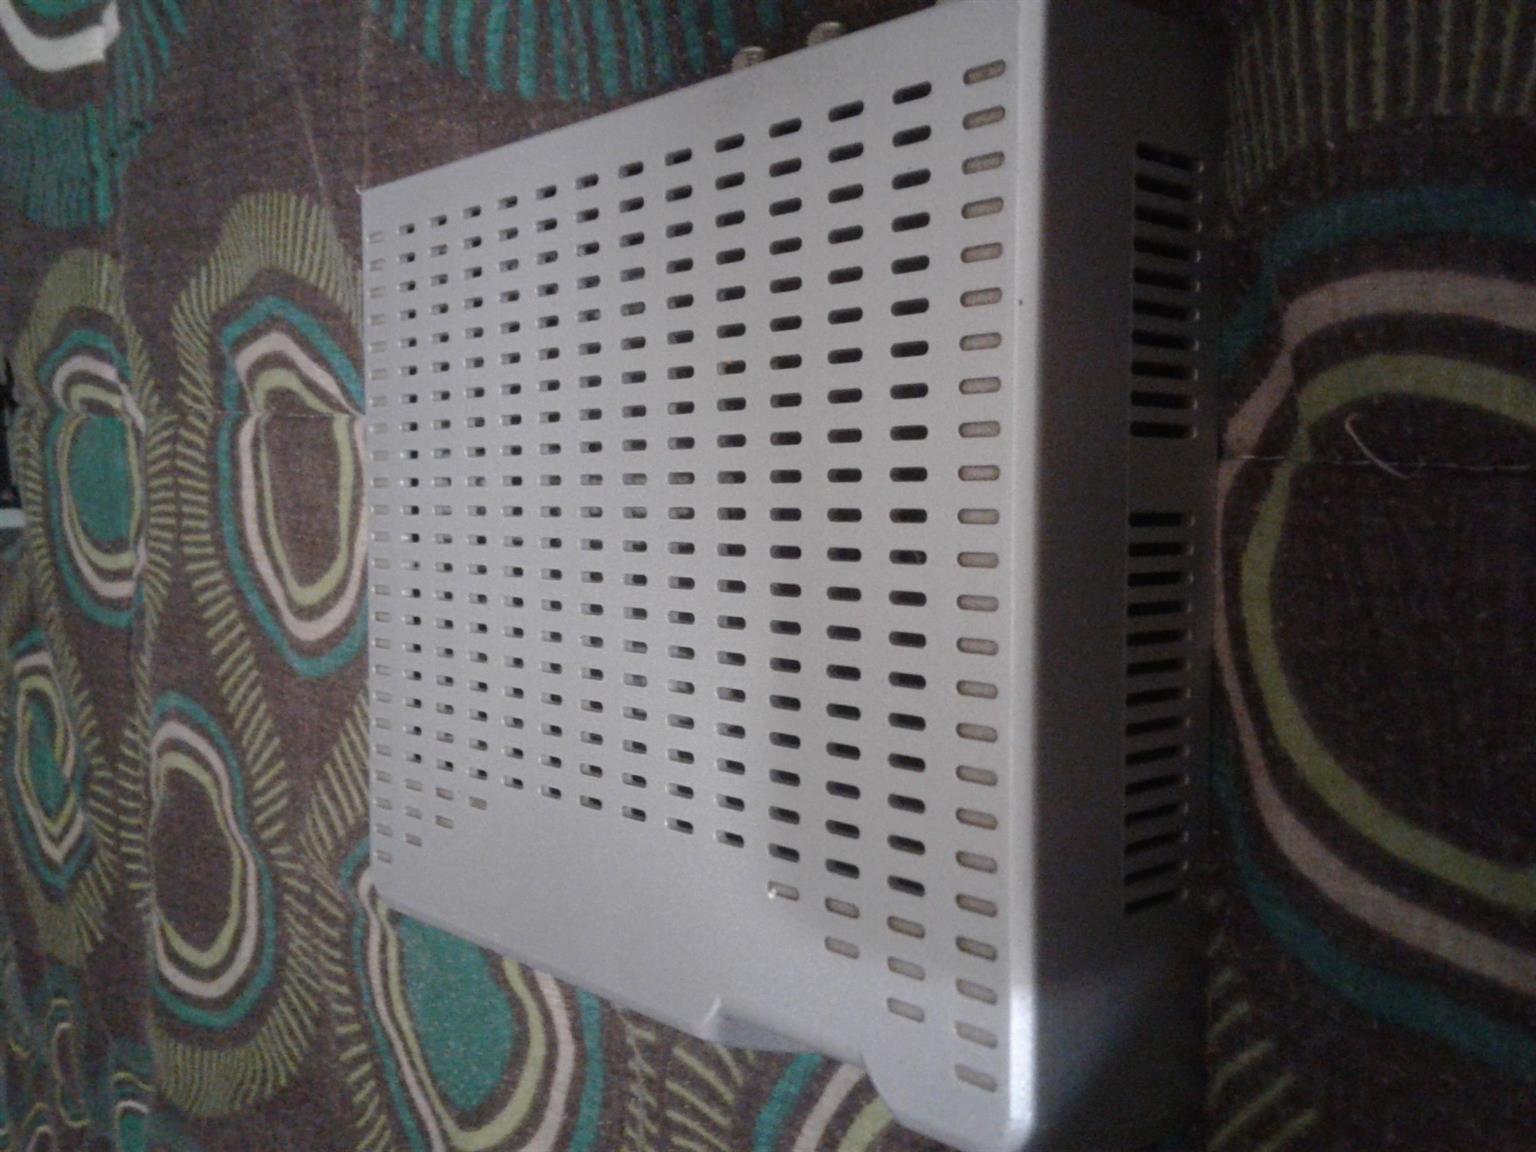 Dstv decoder. Model DSD 1131. Works perfect apart from broken power button on decoder.